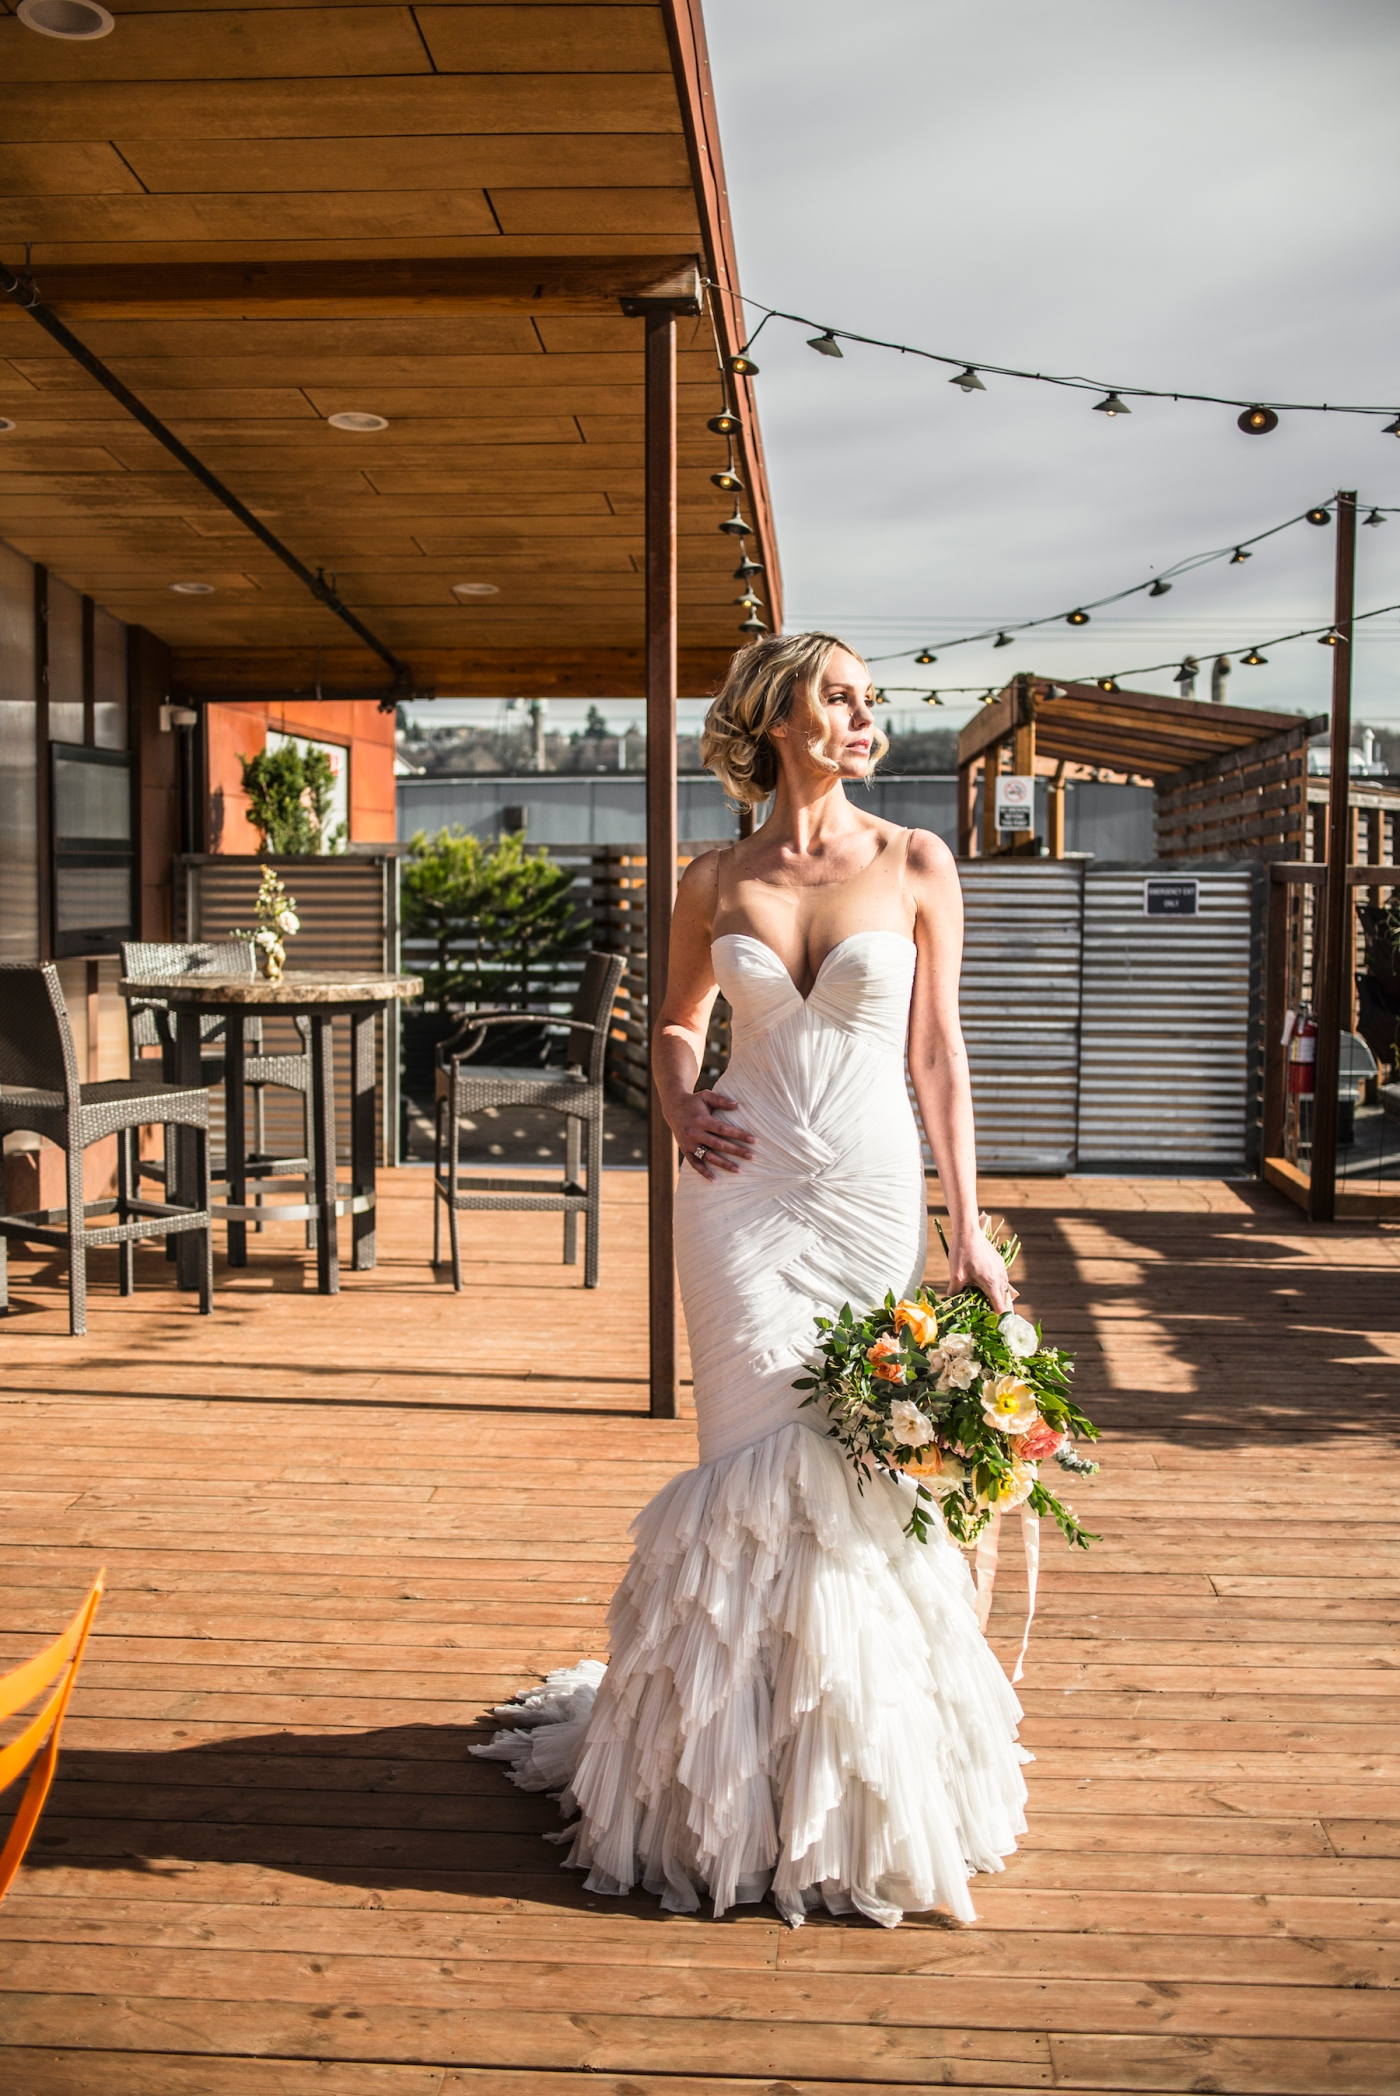 photography_by_jane_speleers_2017_wedding_show_i_do_sodo_within_designed_by_melody_davisdsc_0471